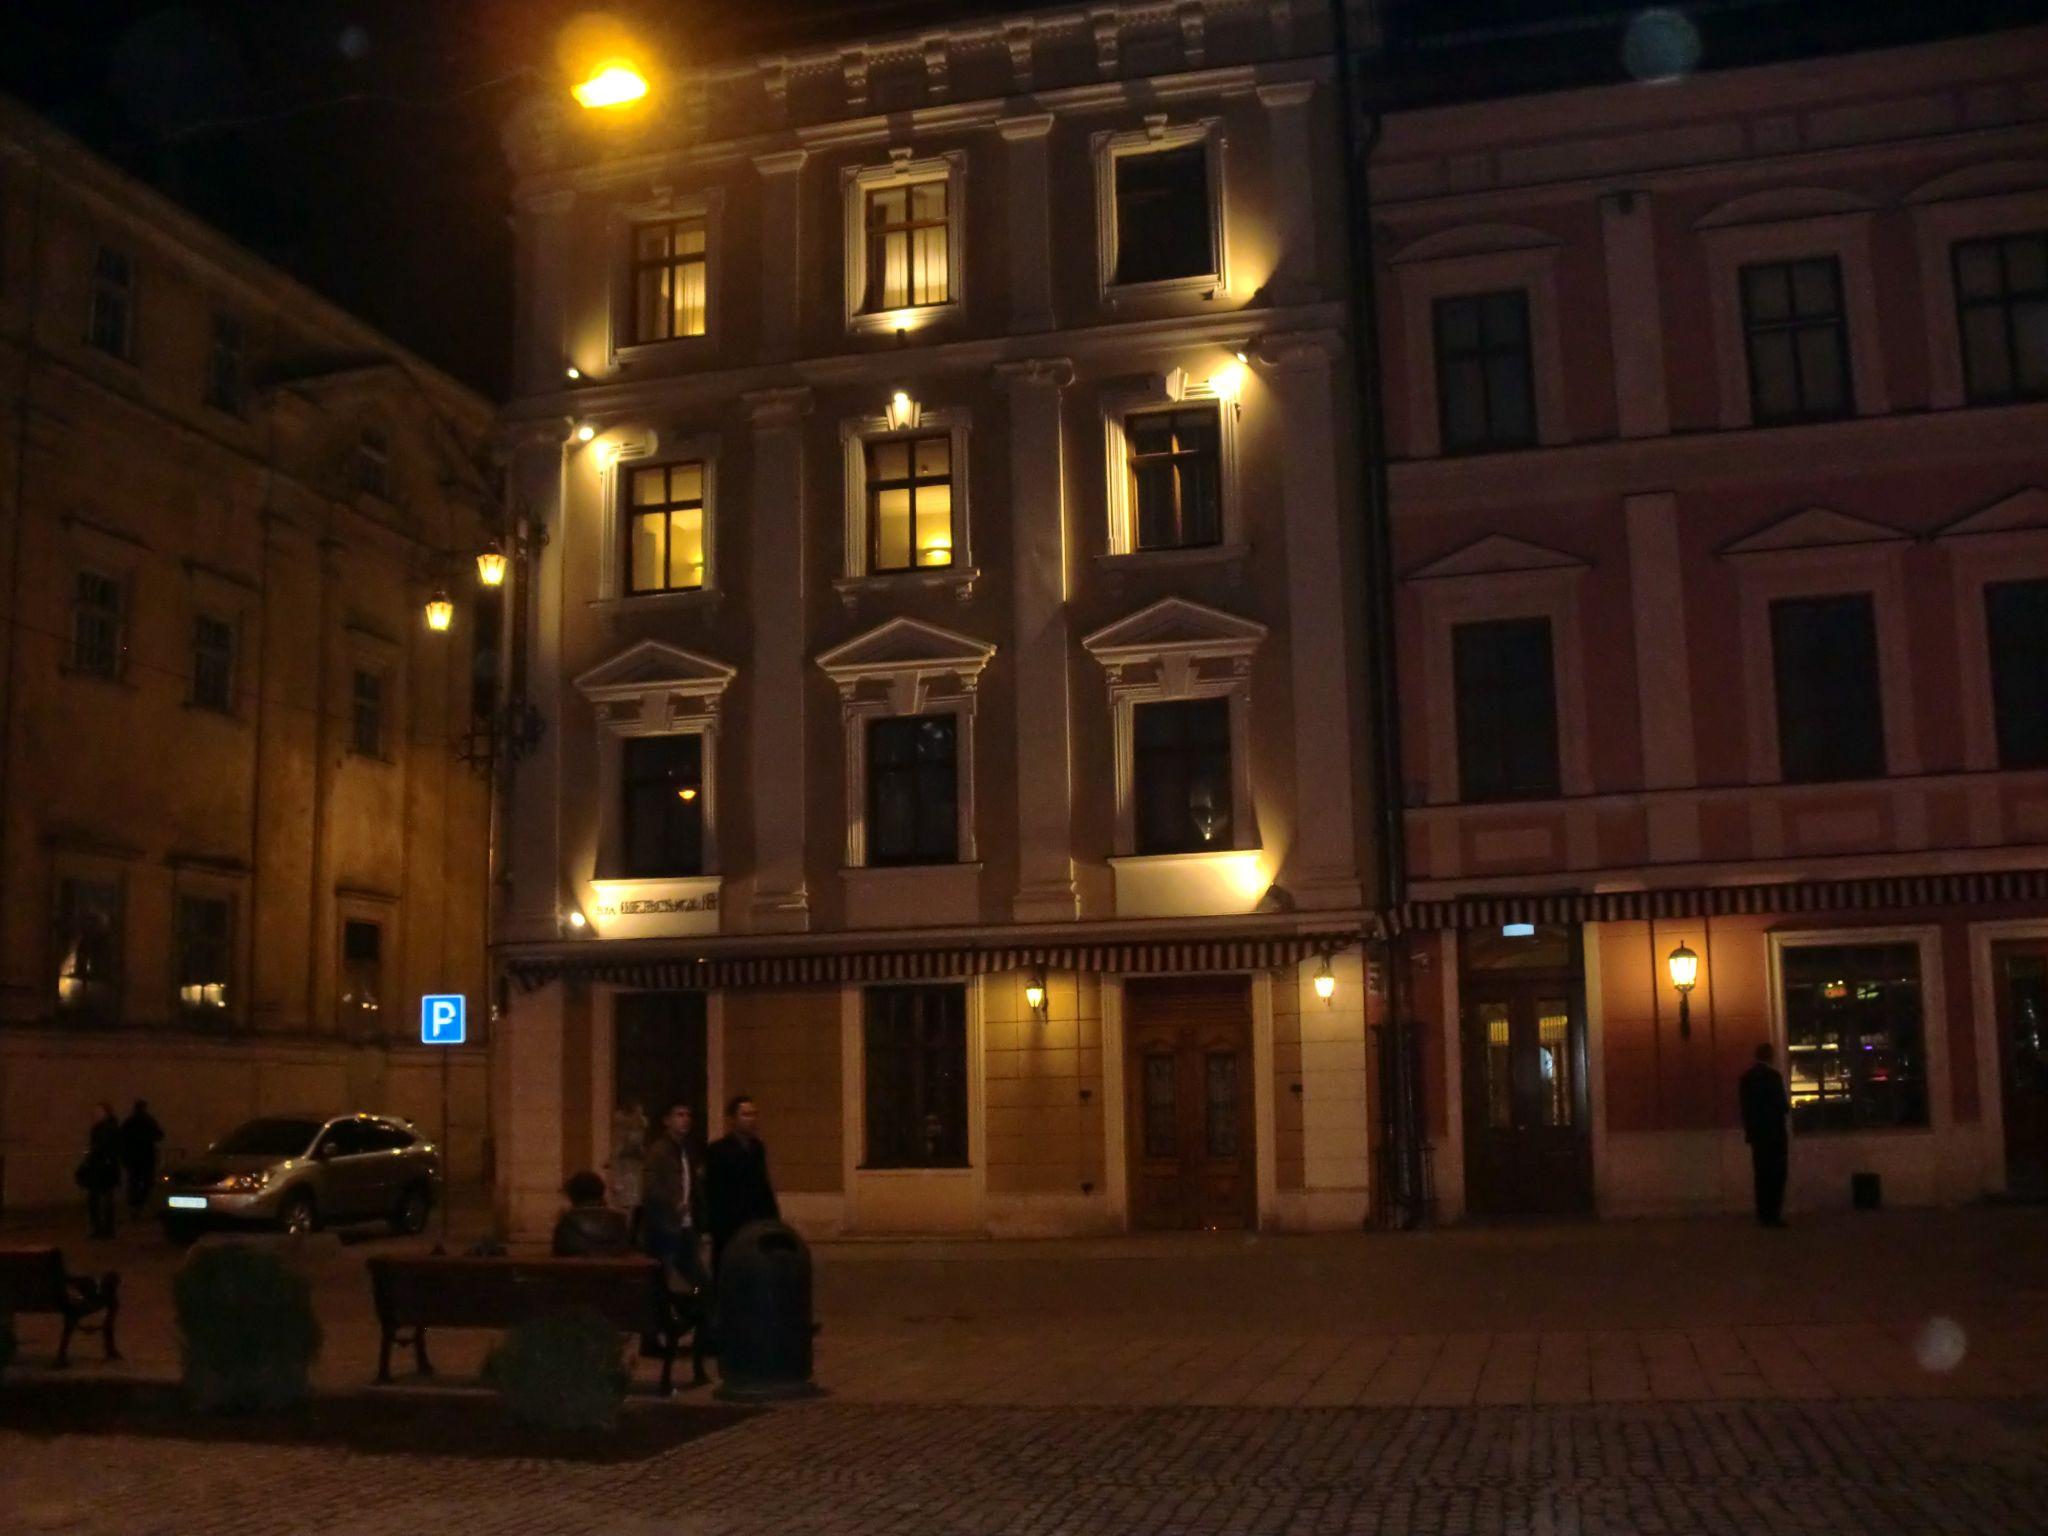 Lviv 1 - Lviv, the Ukrainian pearl